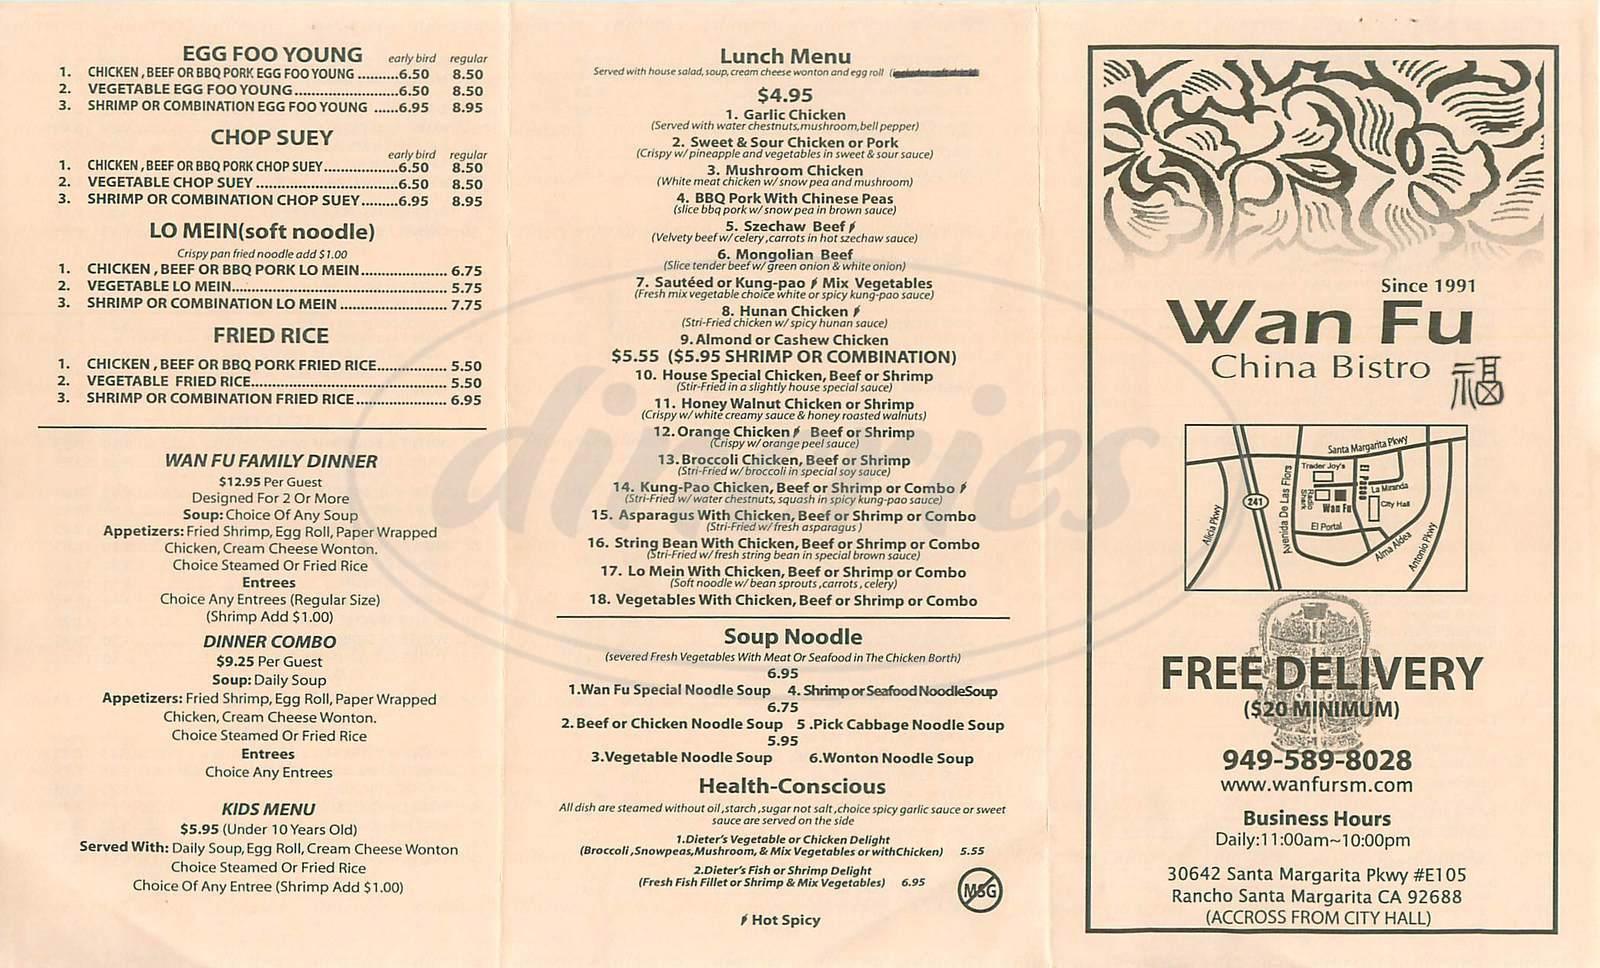 menu for Wan Fu China Bistro